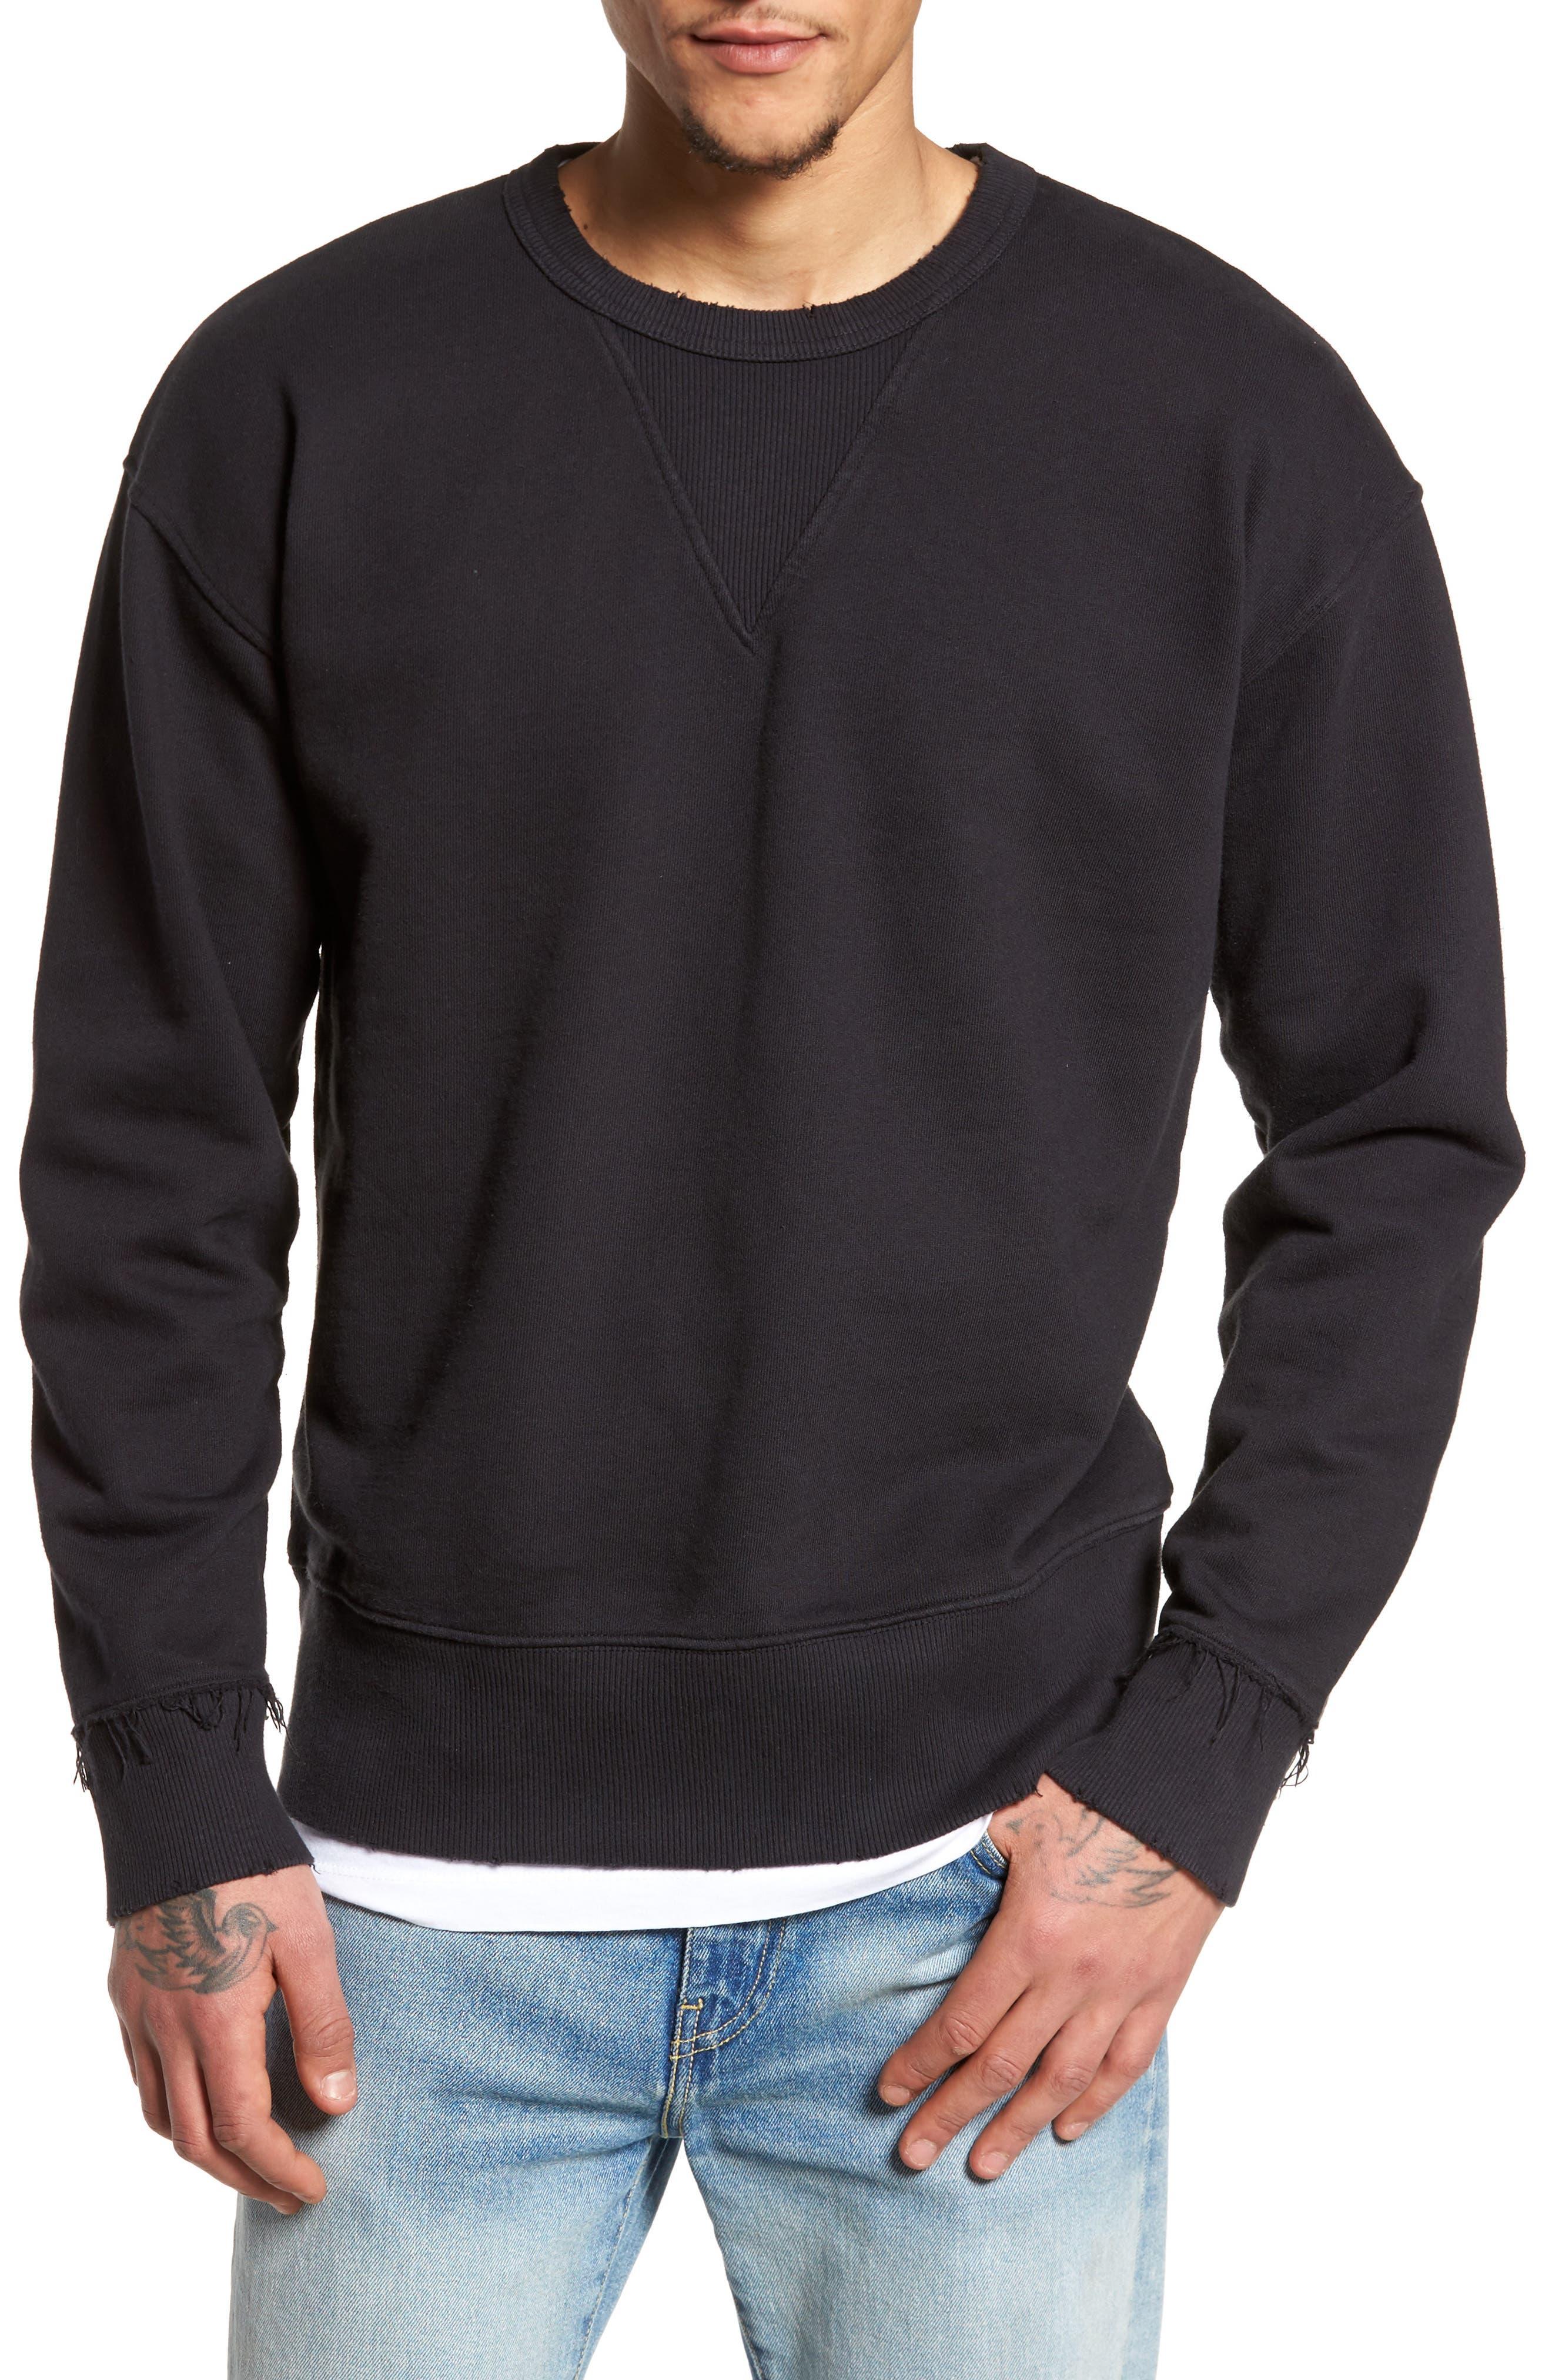 Distressed Sweatshirt,                         Main,                         color, 001